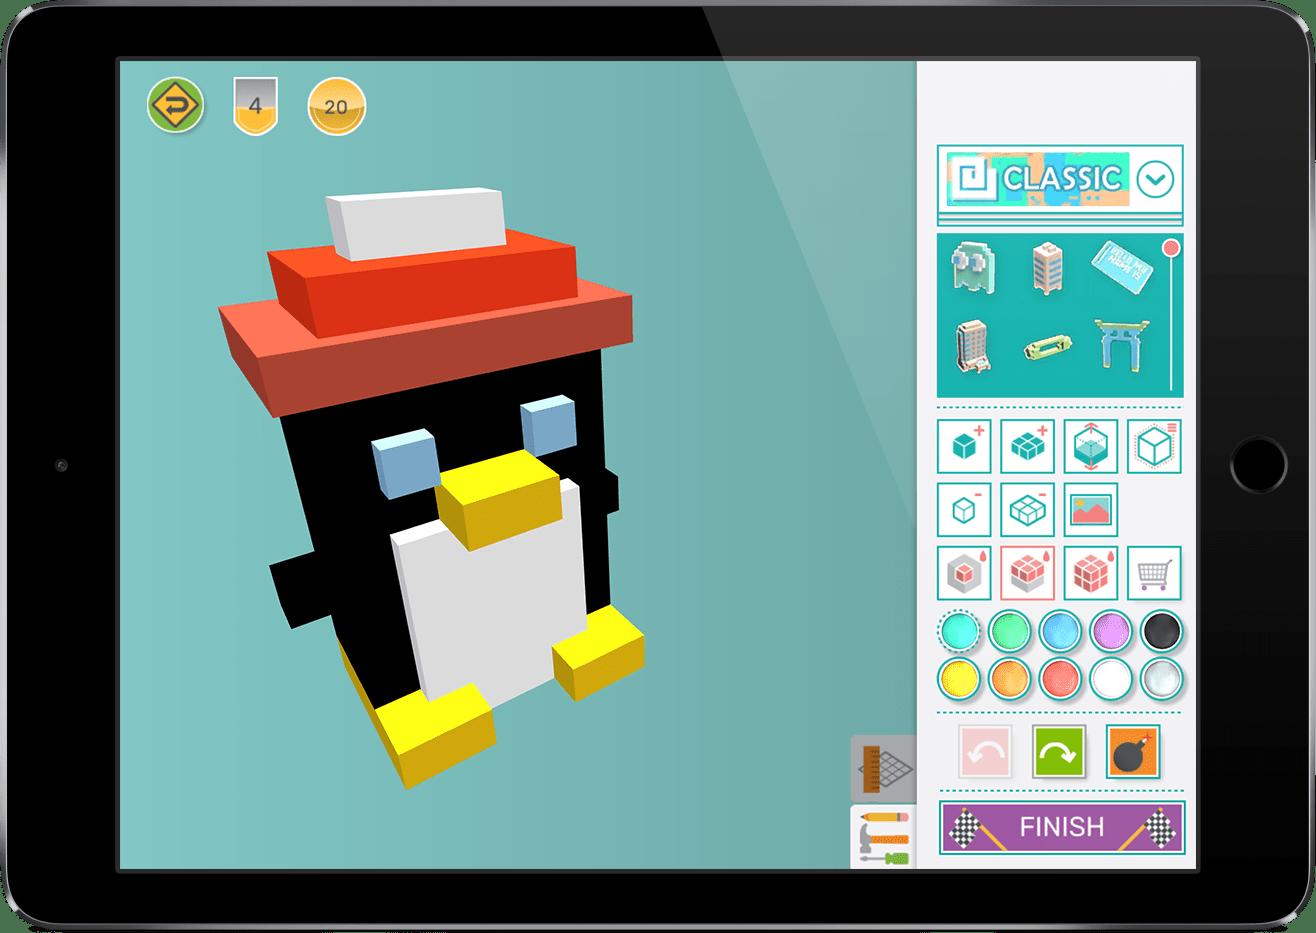 MAK_App Images_Blocker_1805